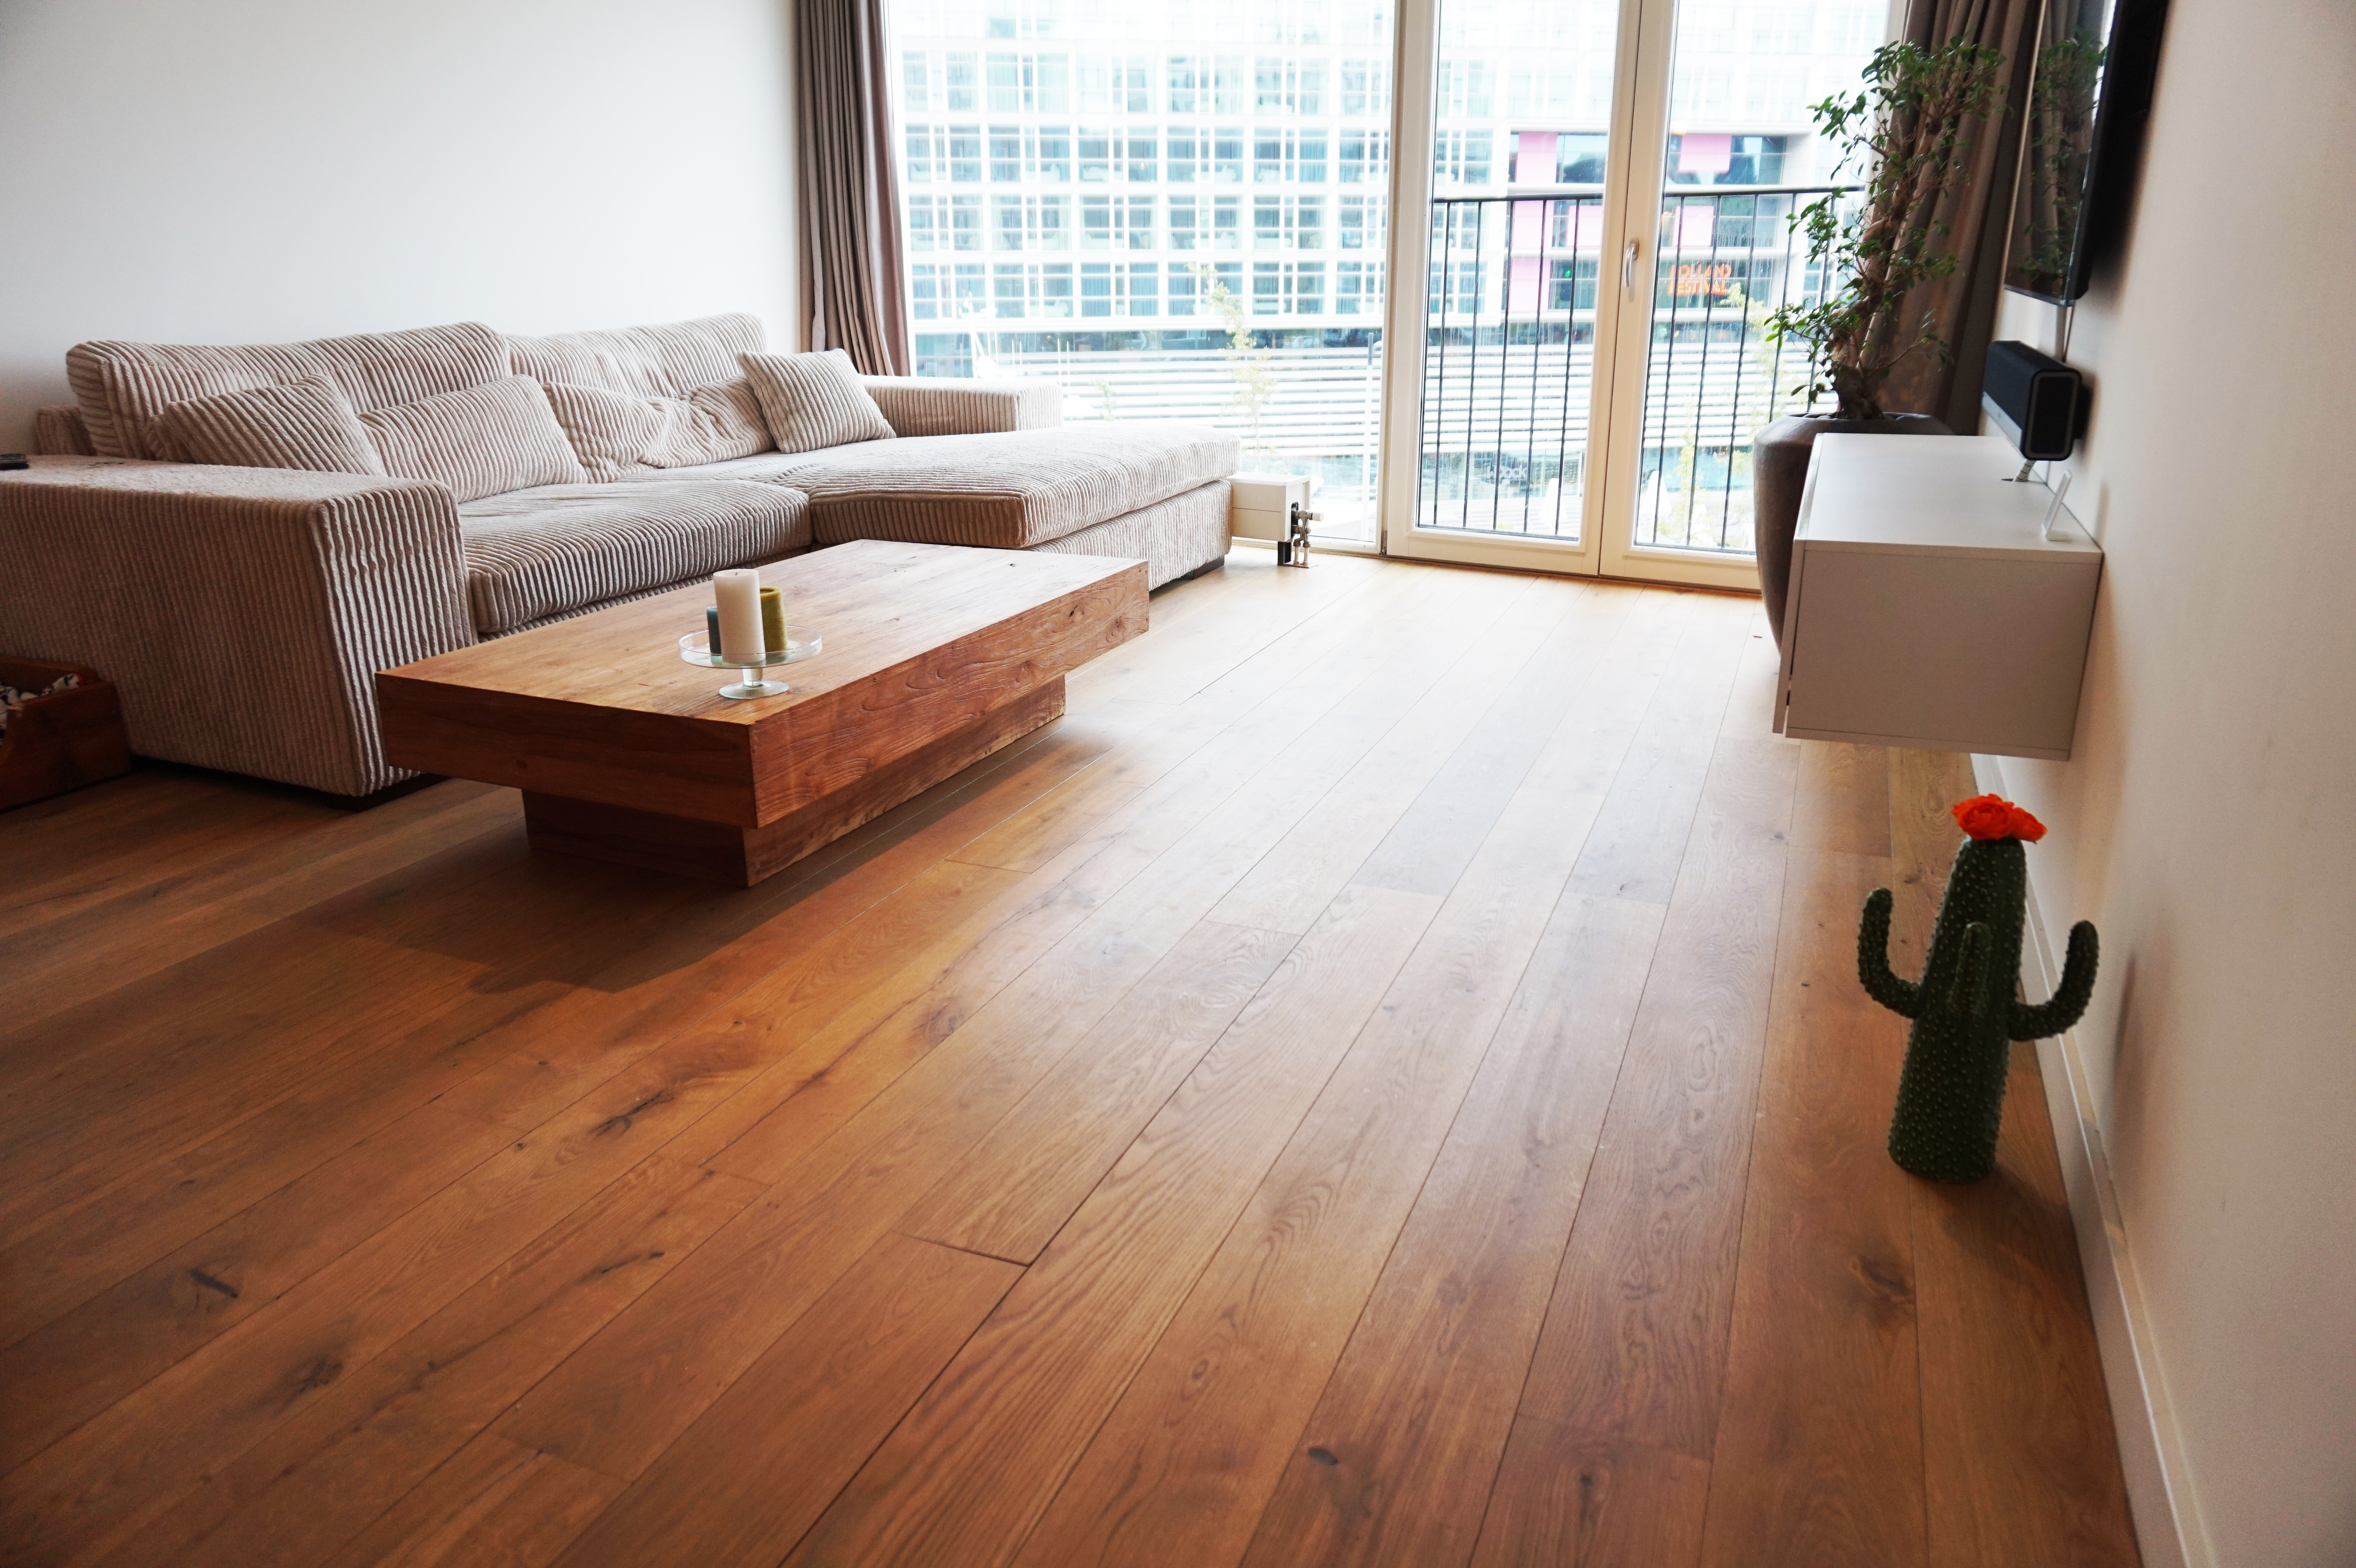 Bastel parket planken vloer amsterdam noord holland bastel